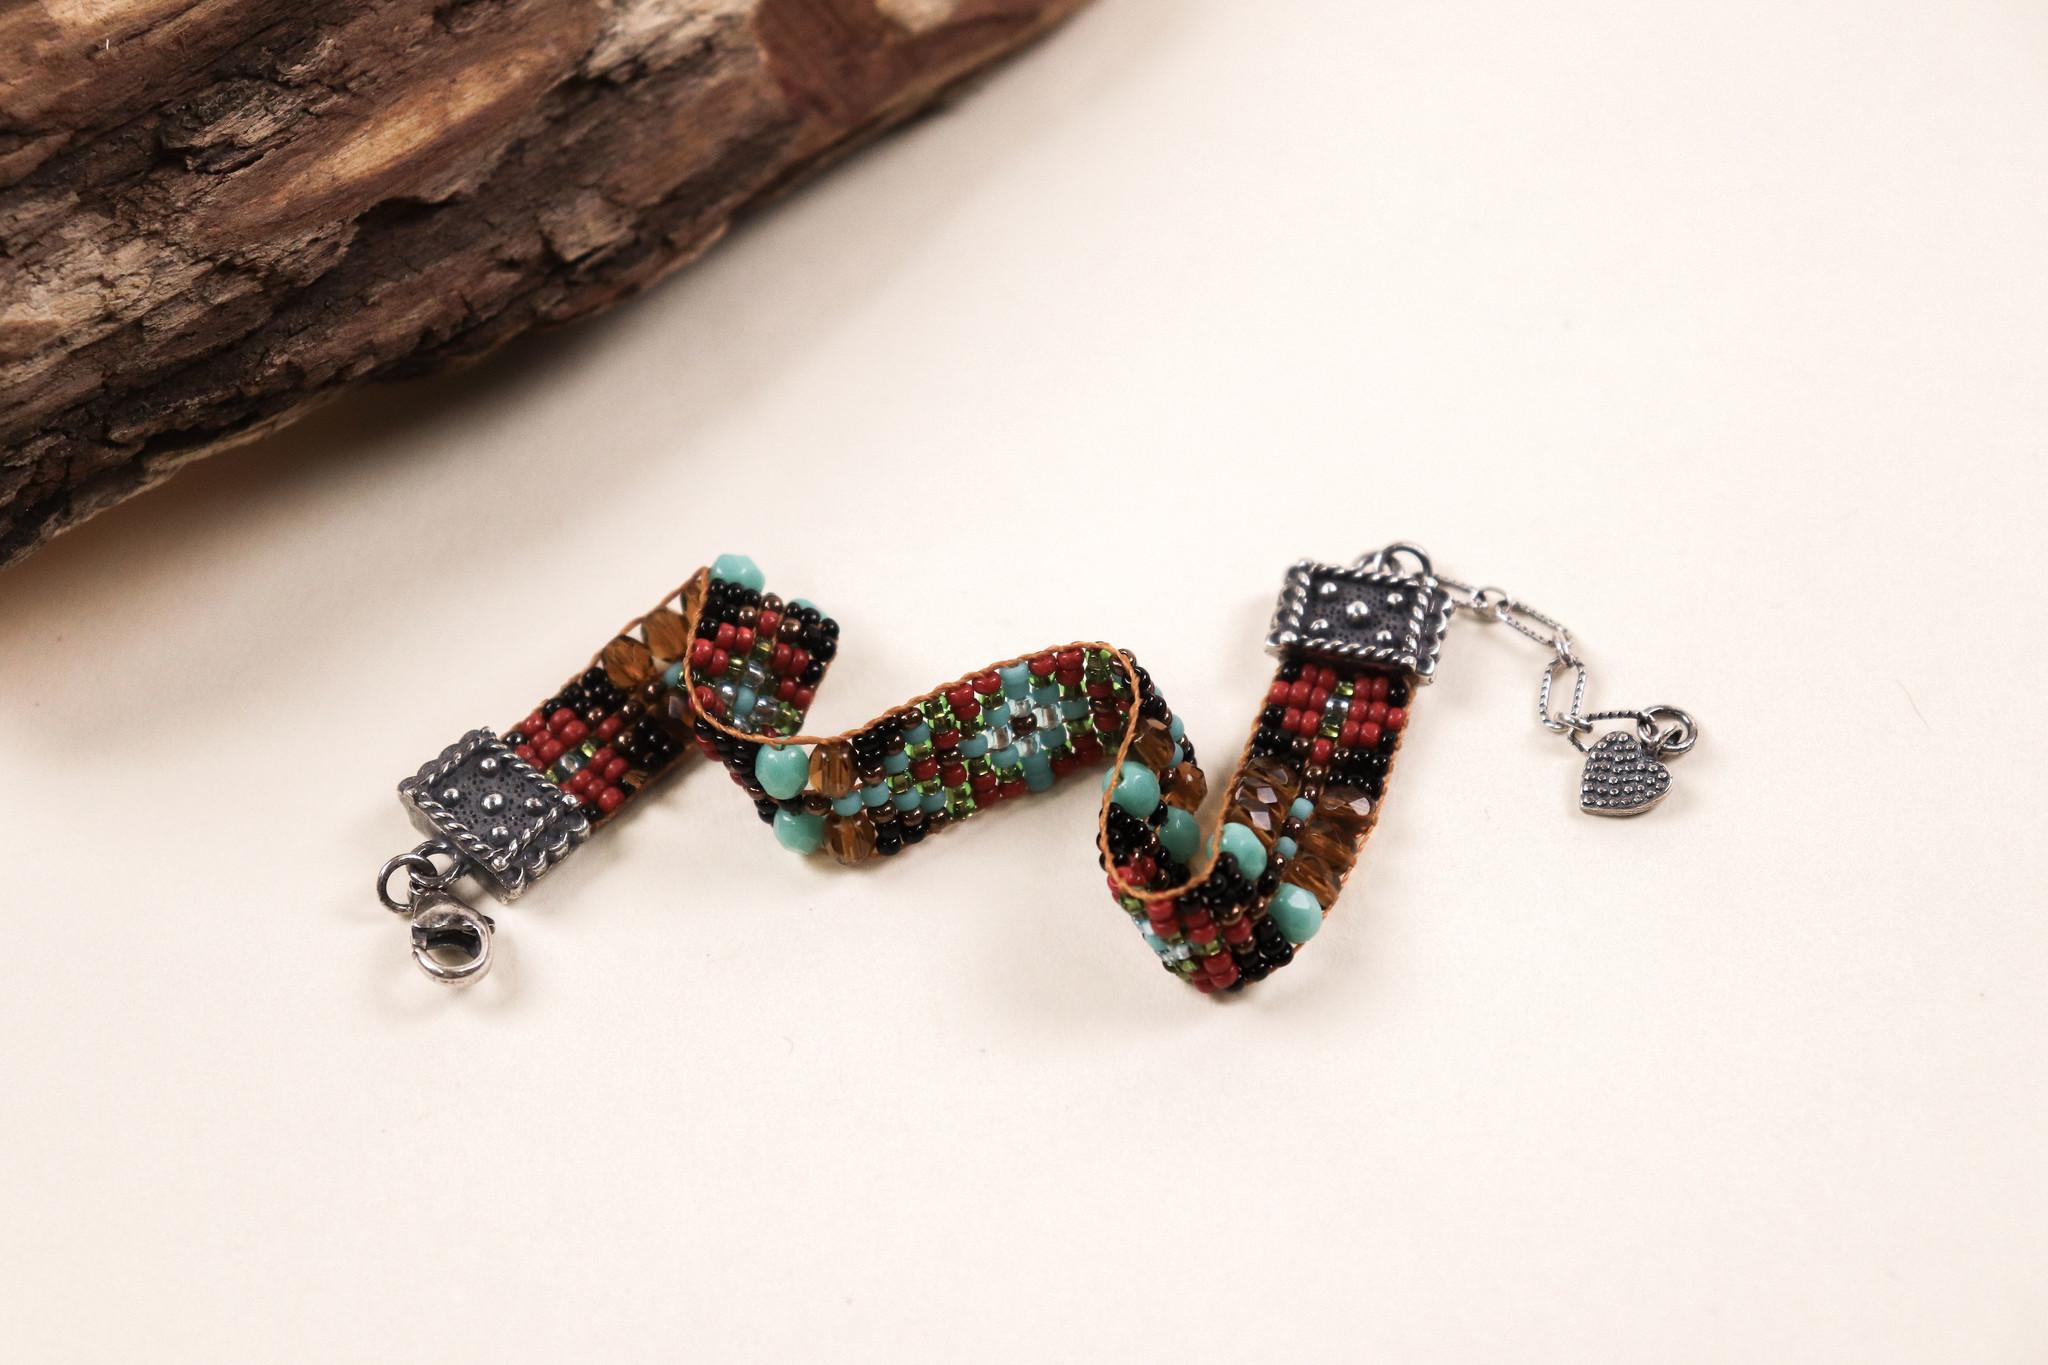 Peyote Bird Designs Chili Rose Heart Charm Clasp Bracelet